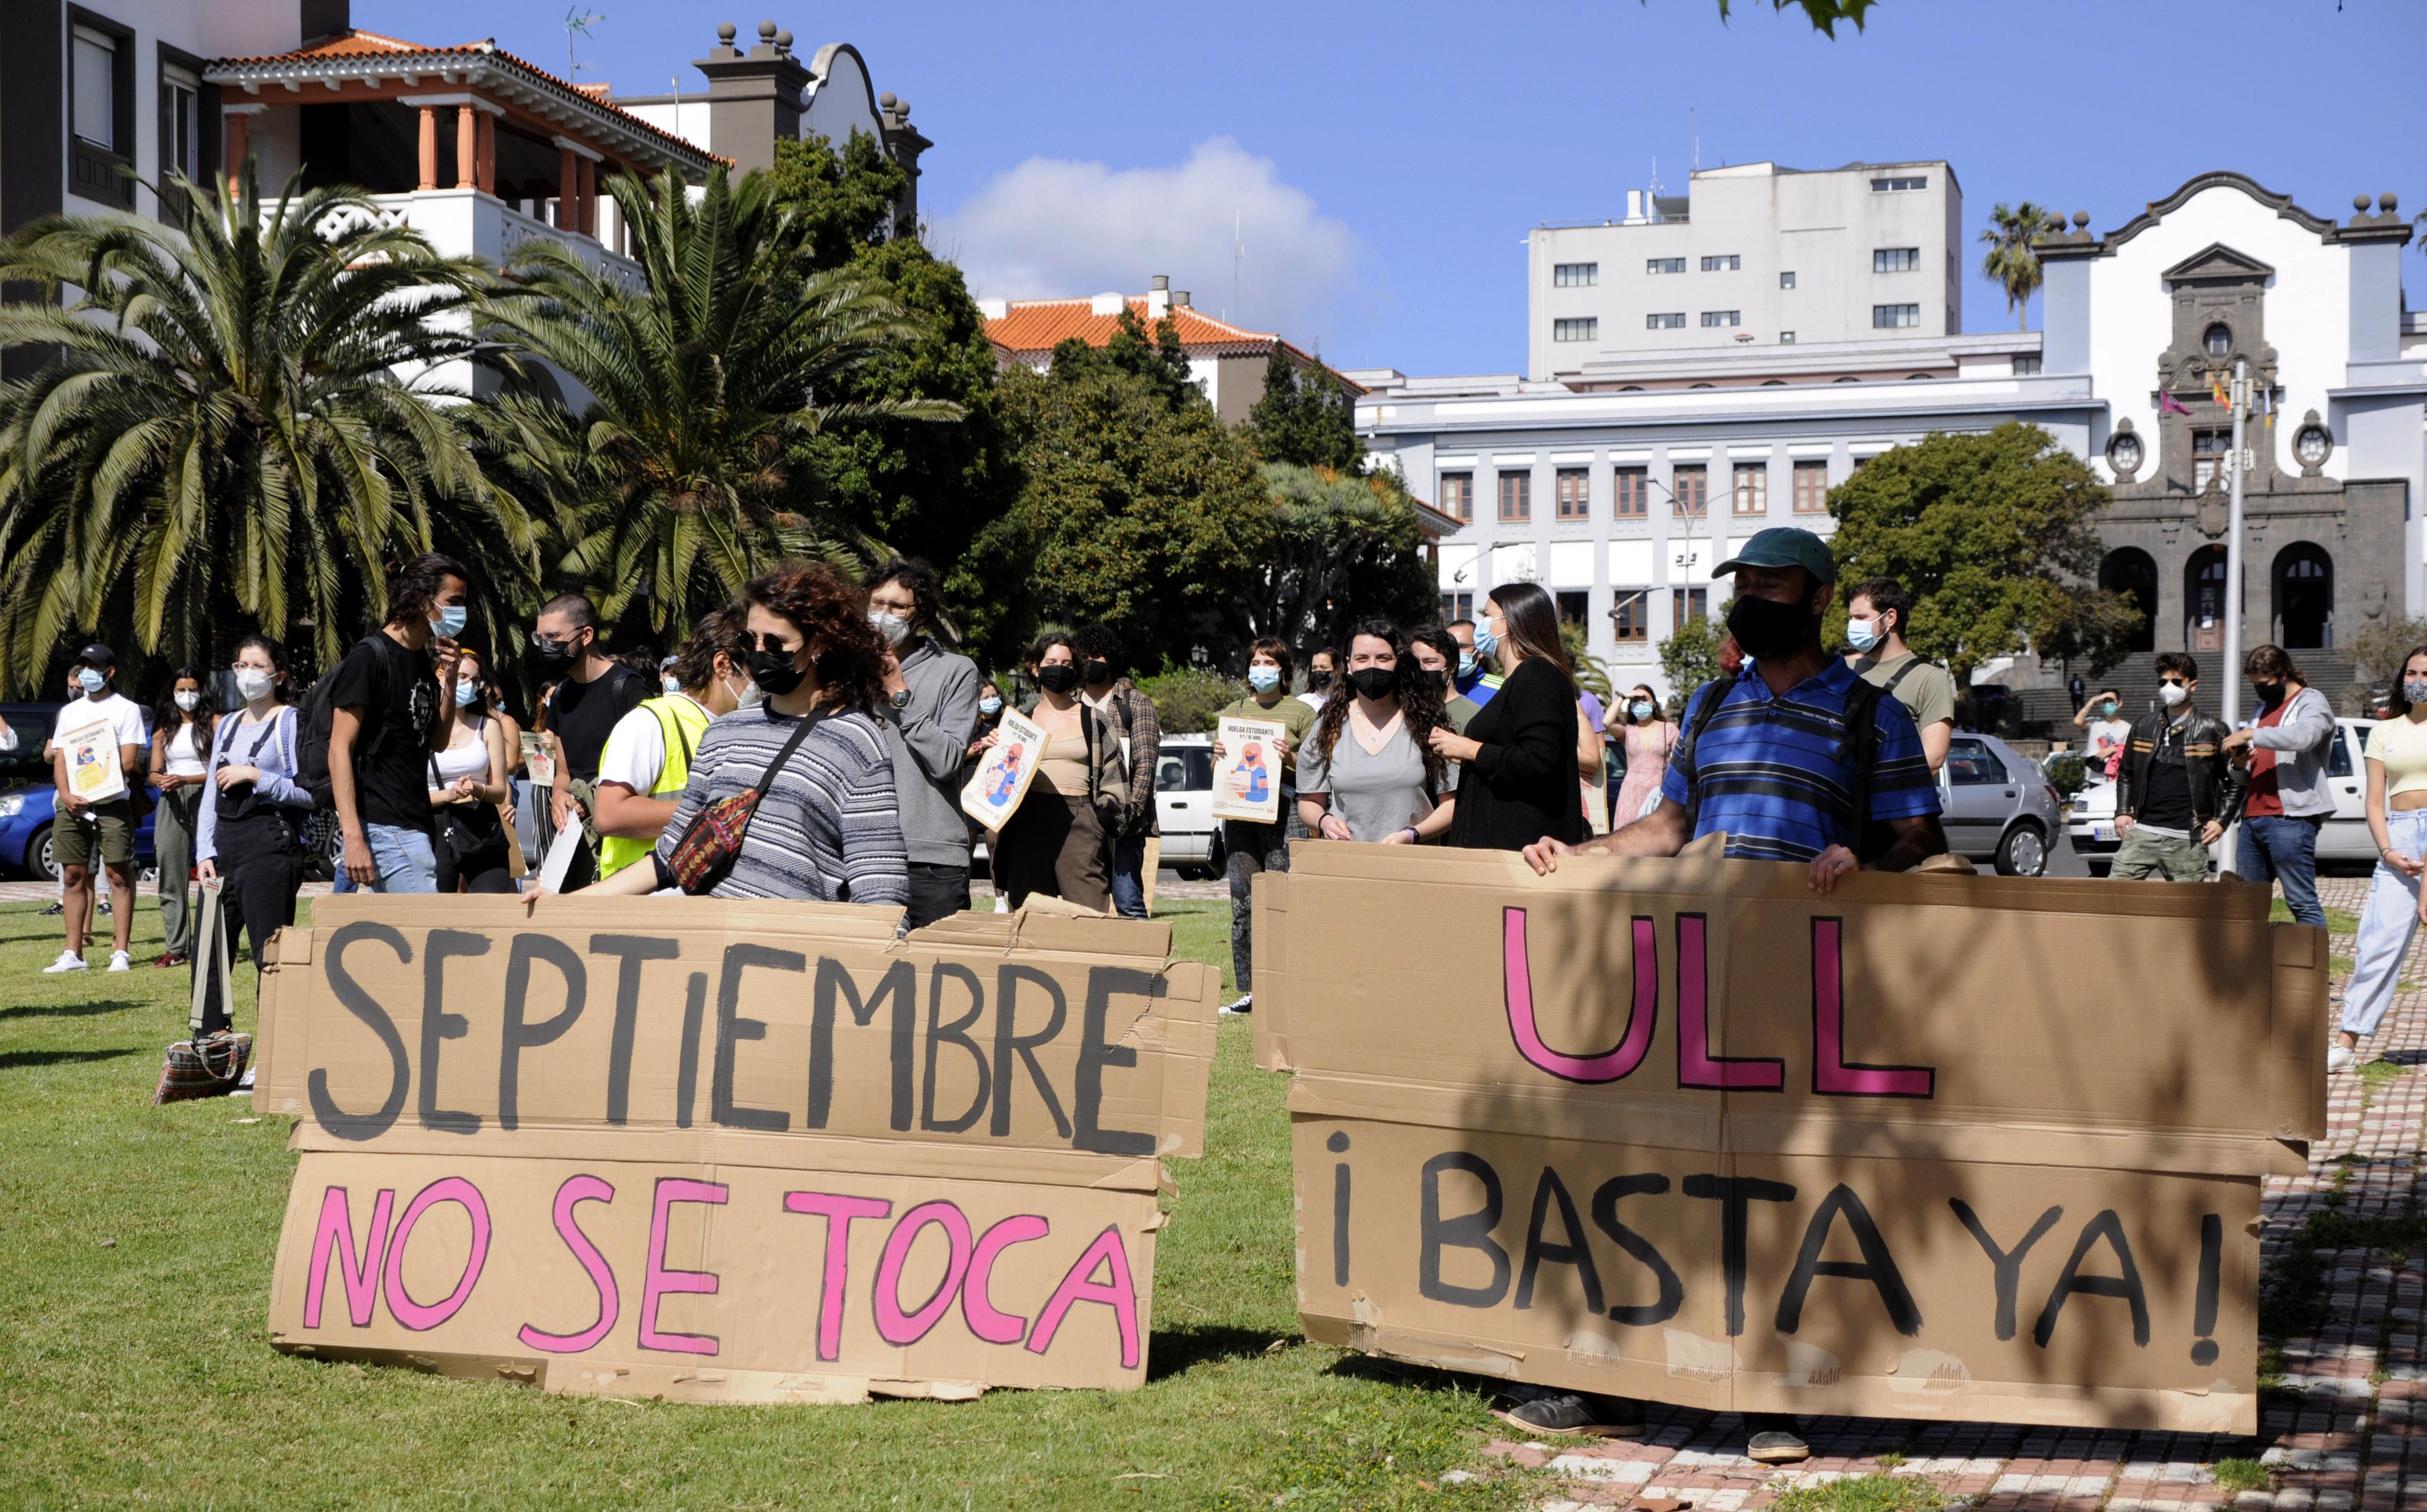 Medio centenar de estudiantes defiende la tercera convocatoria en la ULL